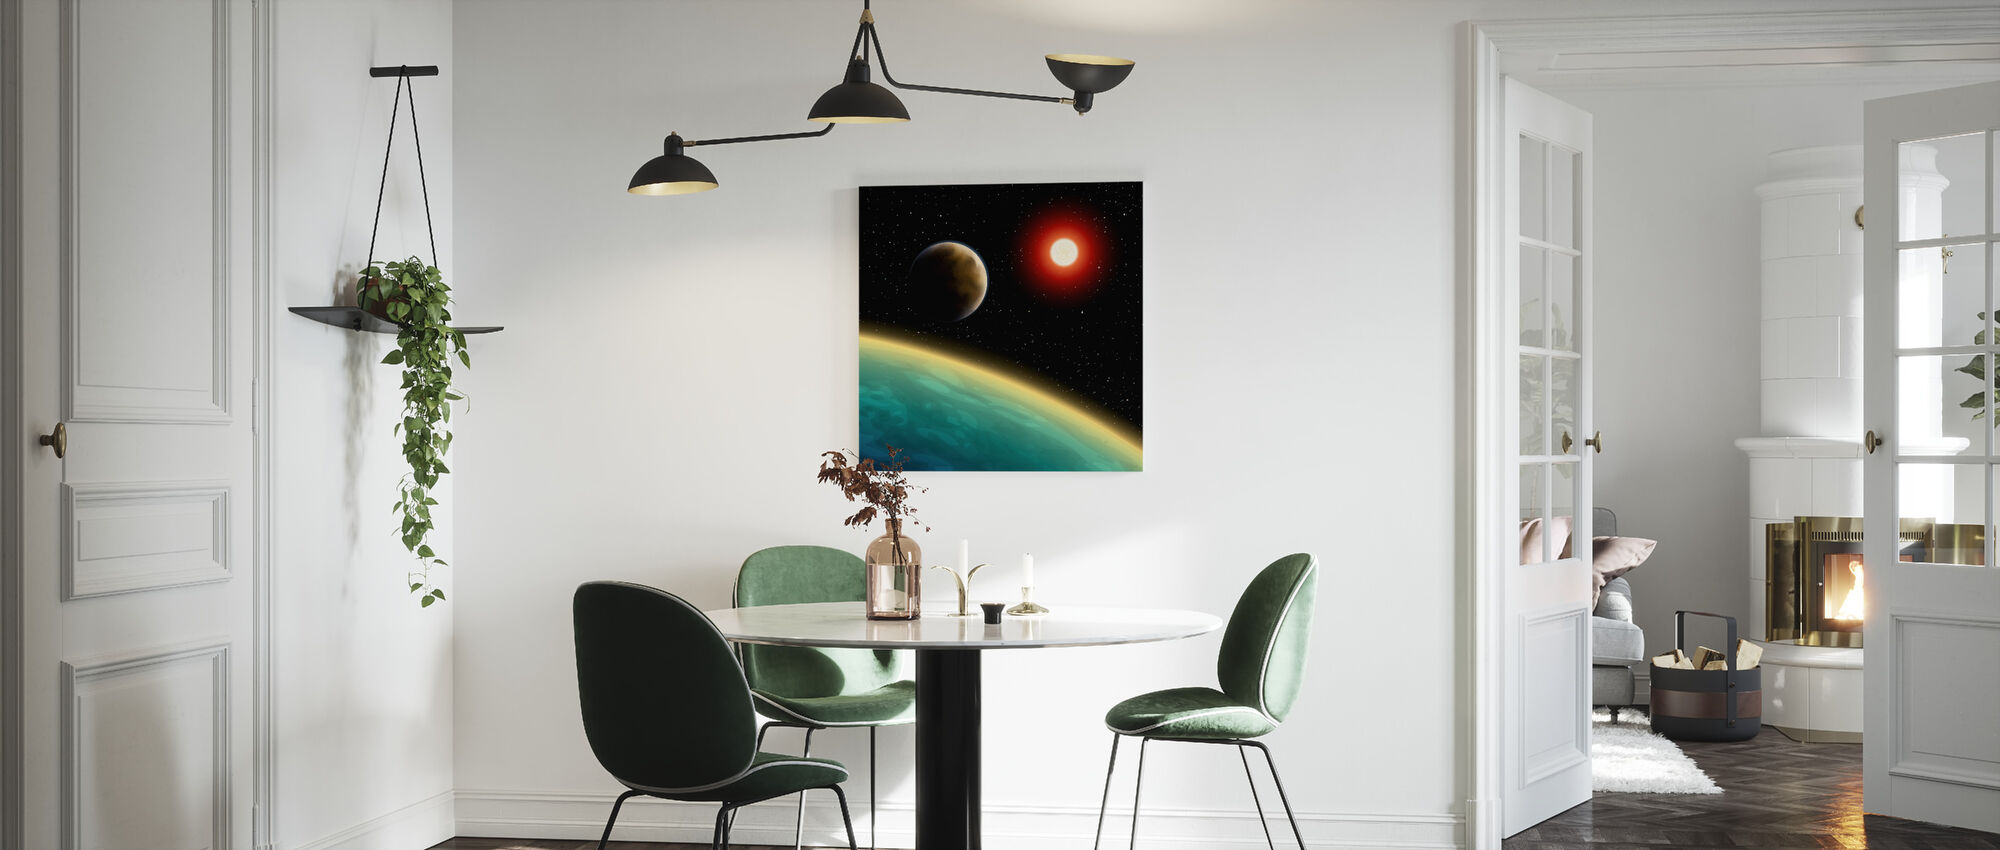 Starry Cosmos - Canvas print - Kitchen